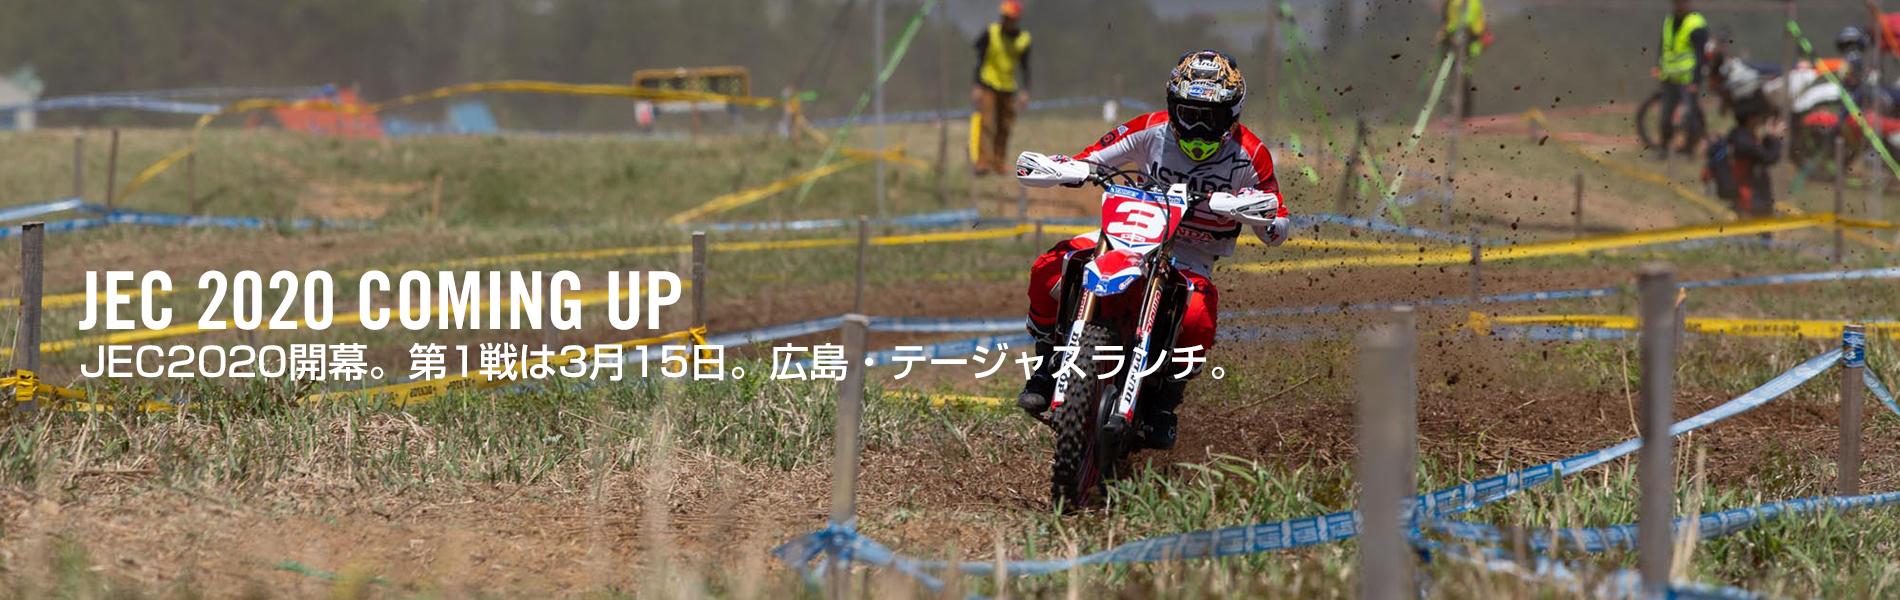 JEC Rnd1 Hiroshima